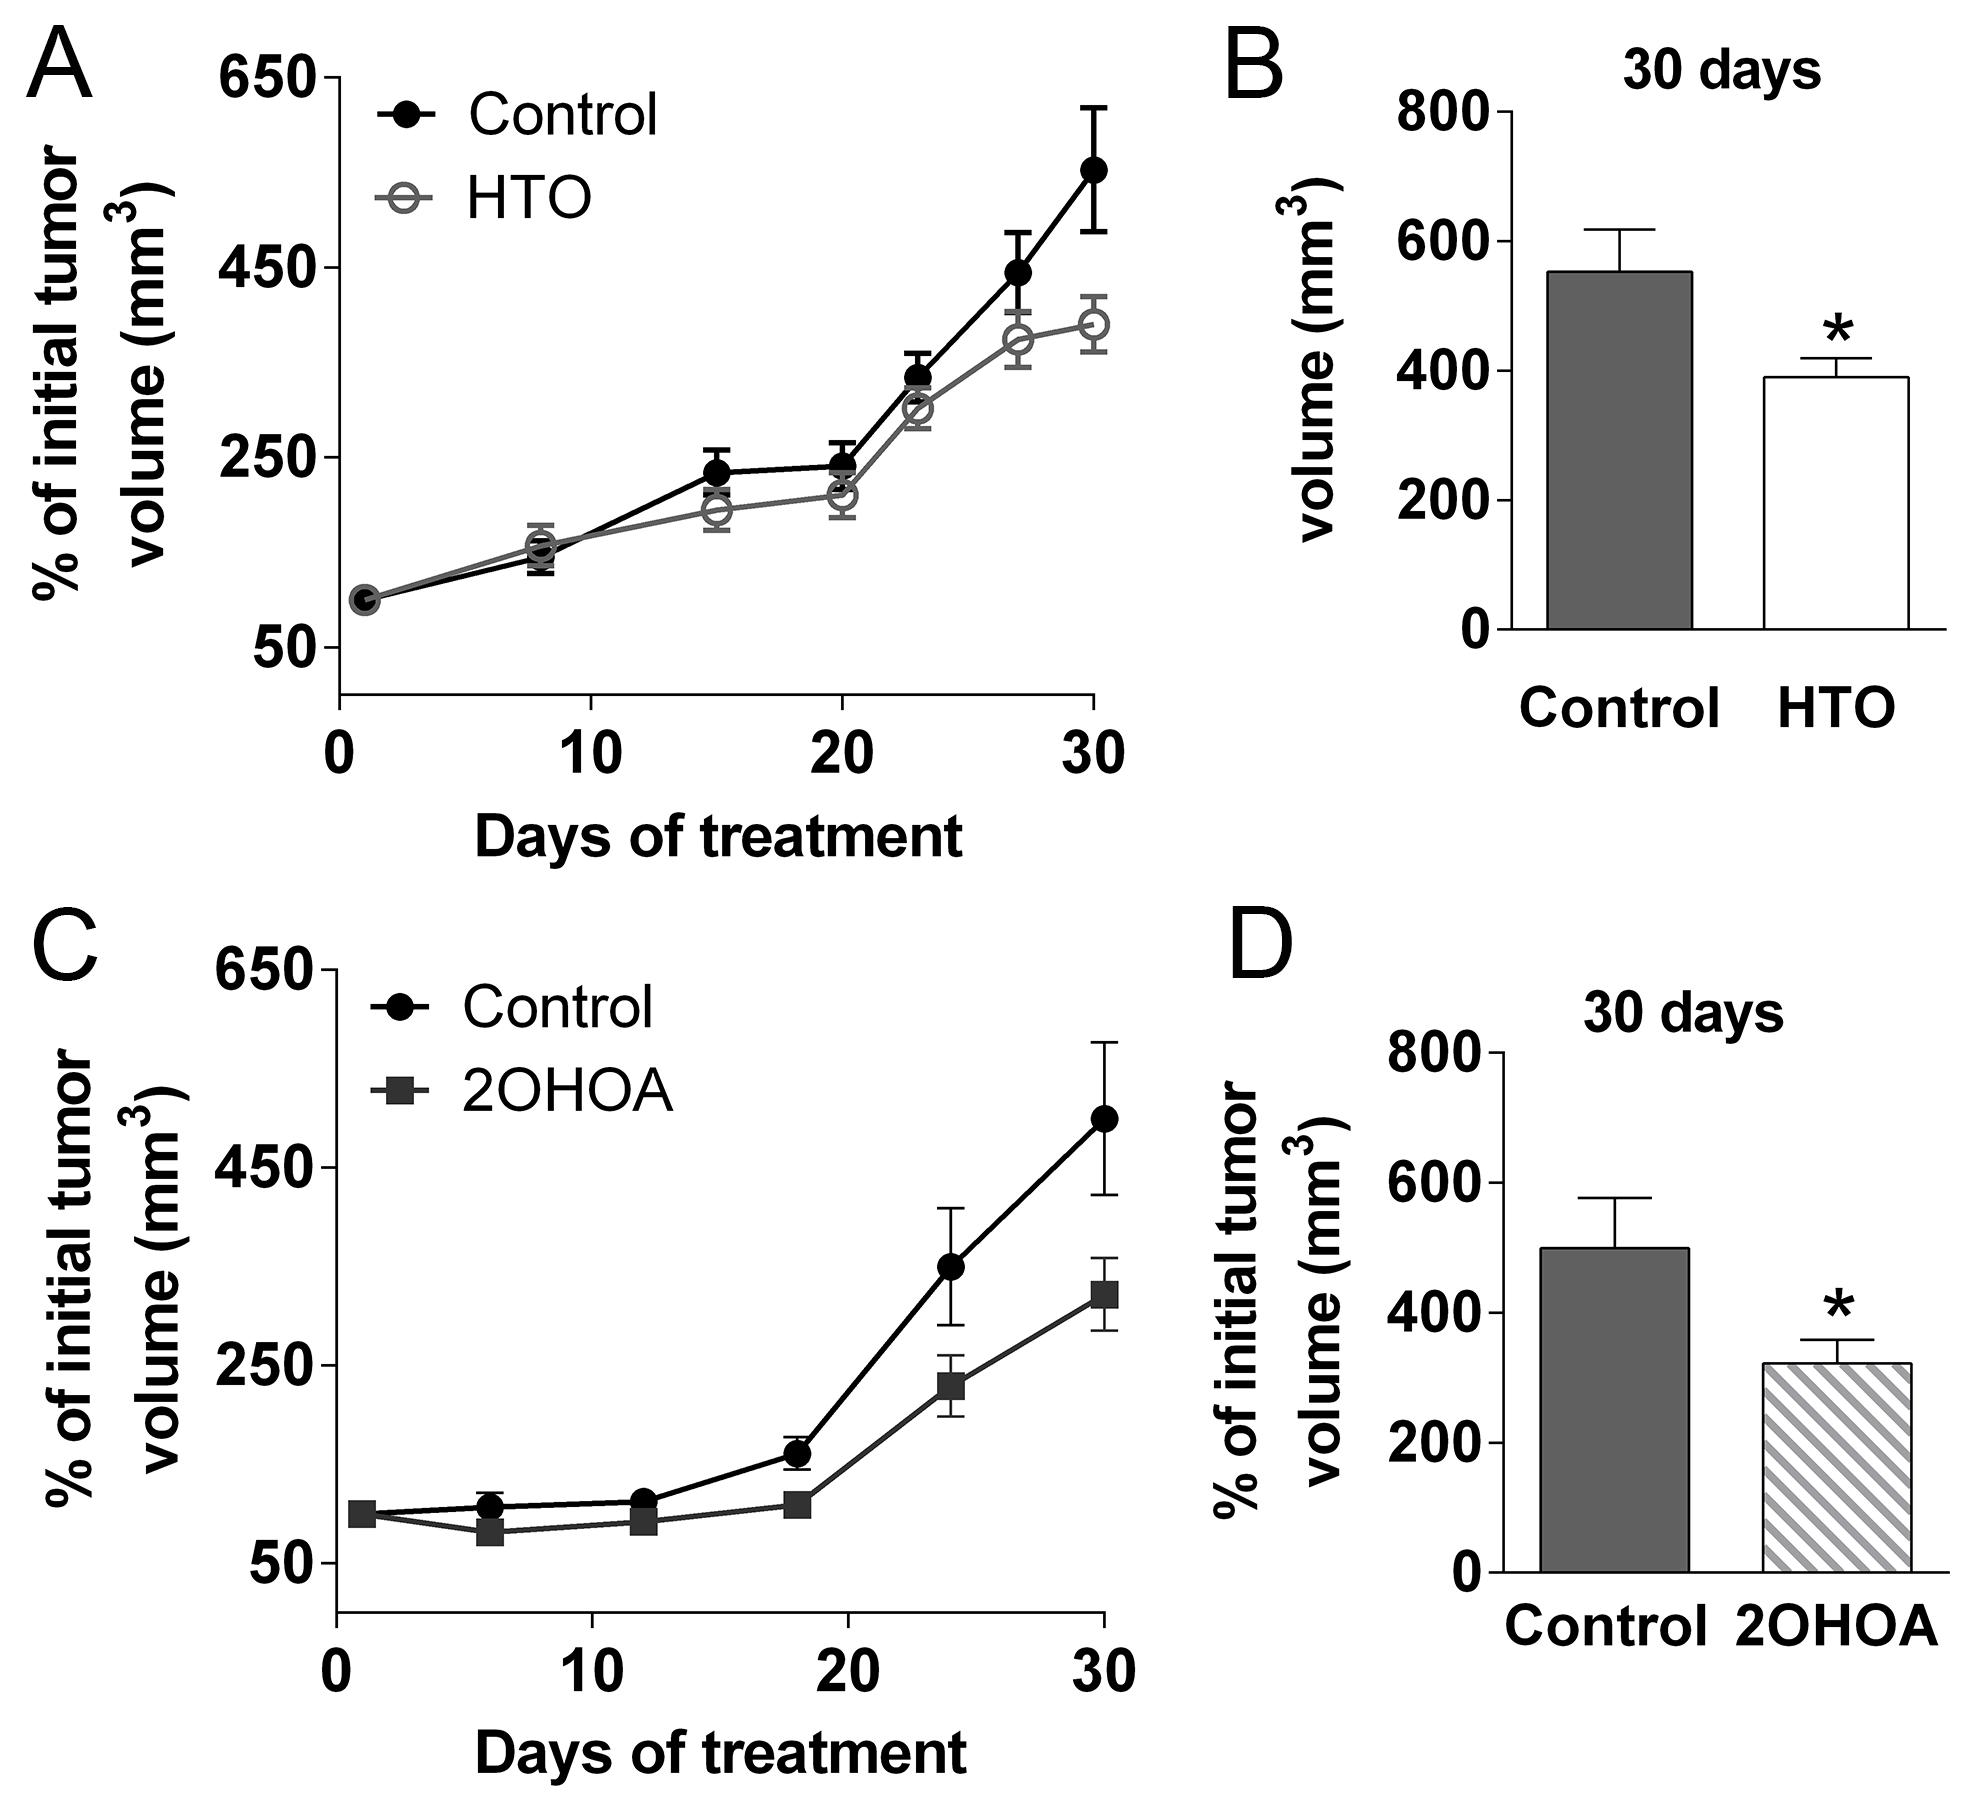 HTO and 2OHOA inhibit tumor progression in vivo.